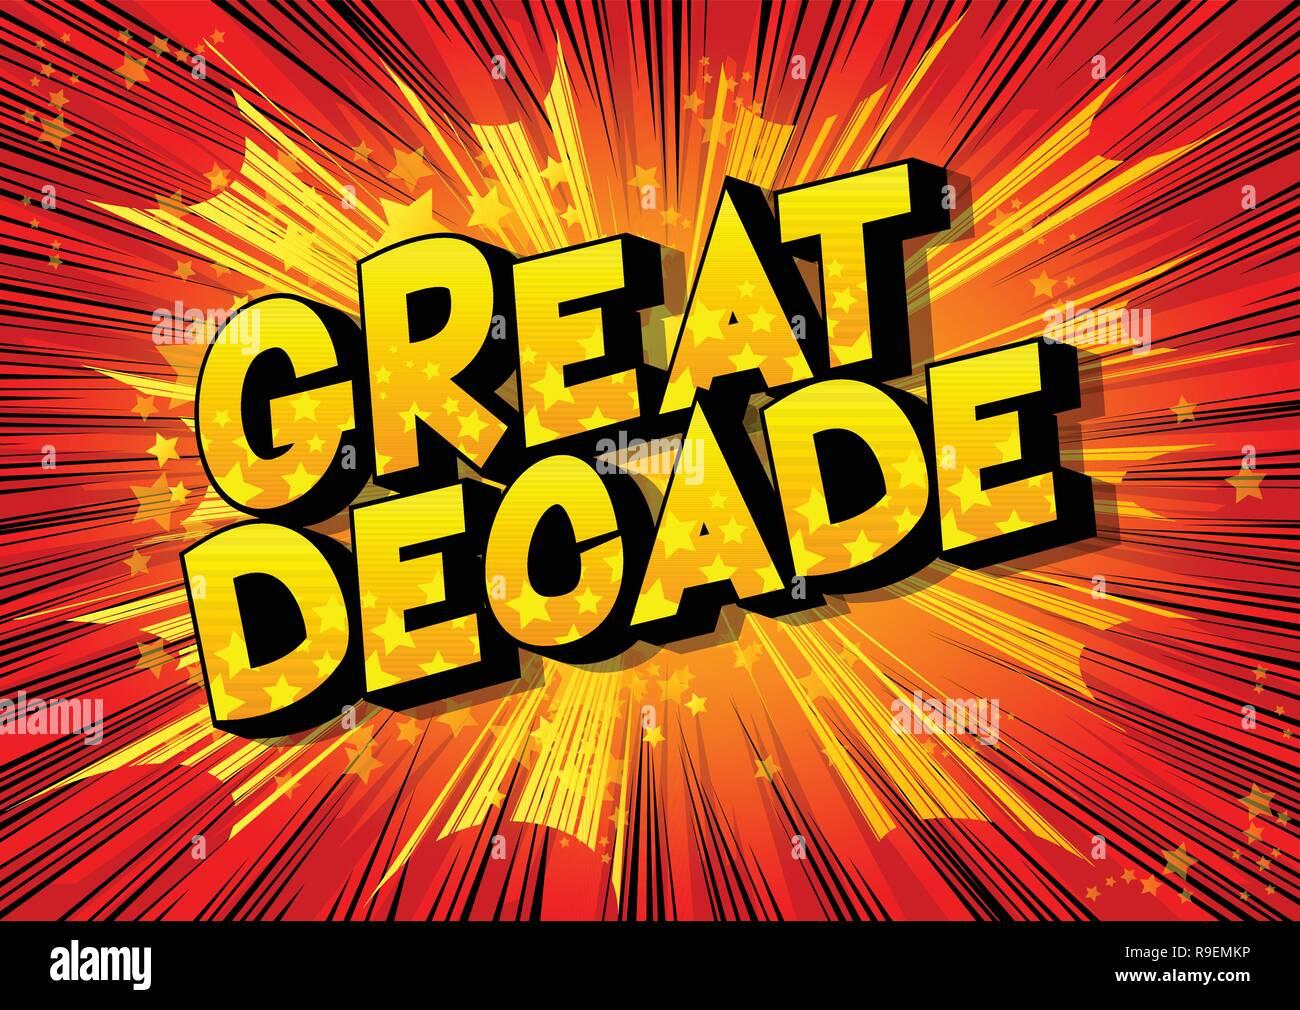 Jahrzehnt - Vektor illustrierte Comic Stil Phrase auf abstrakten Hintergrund. Stockbild